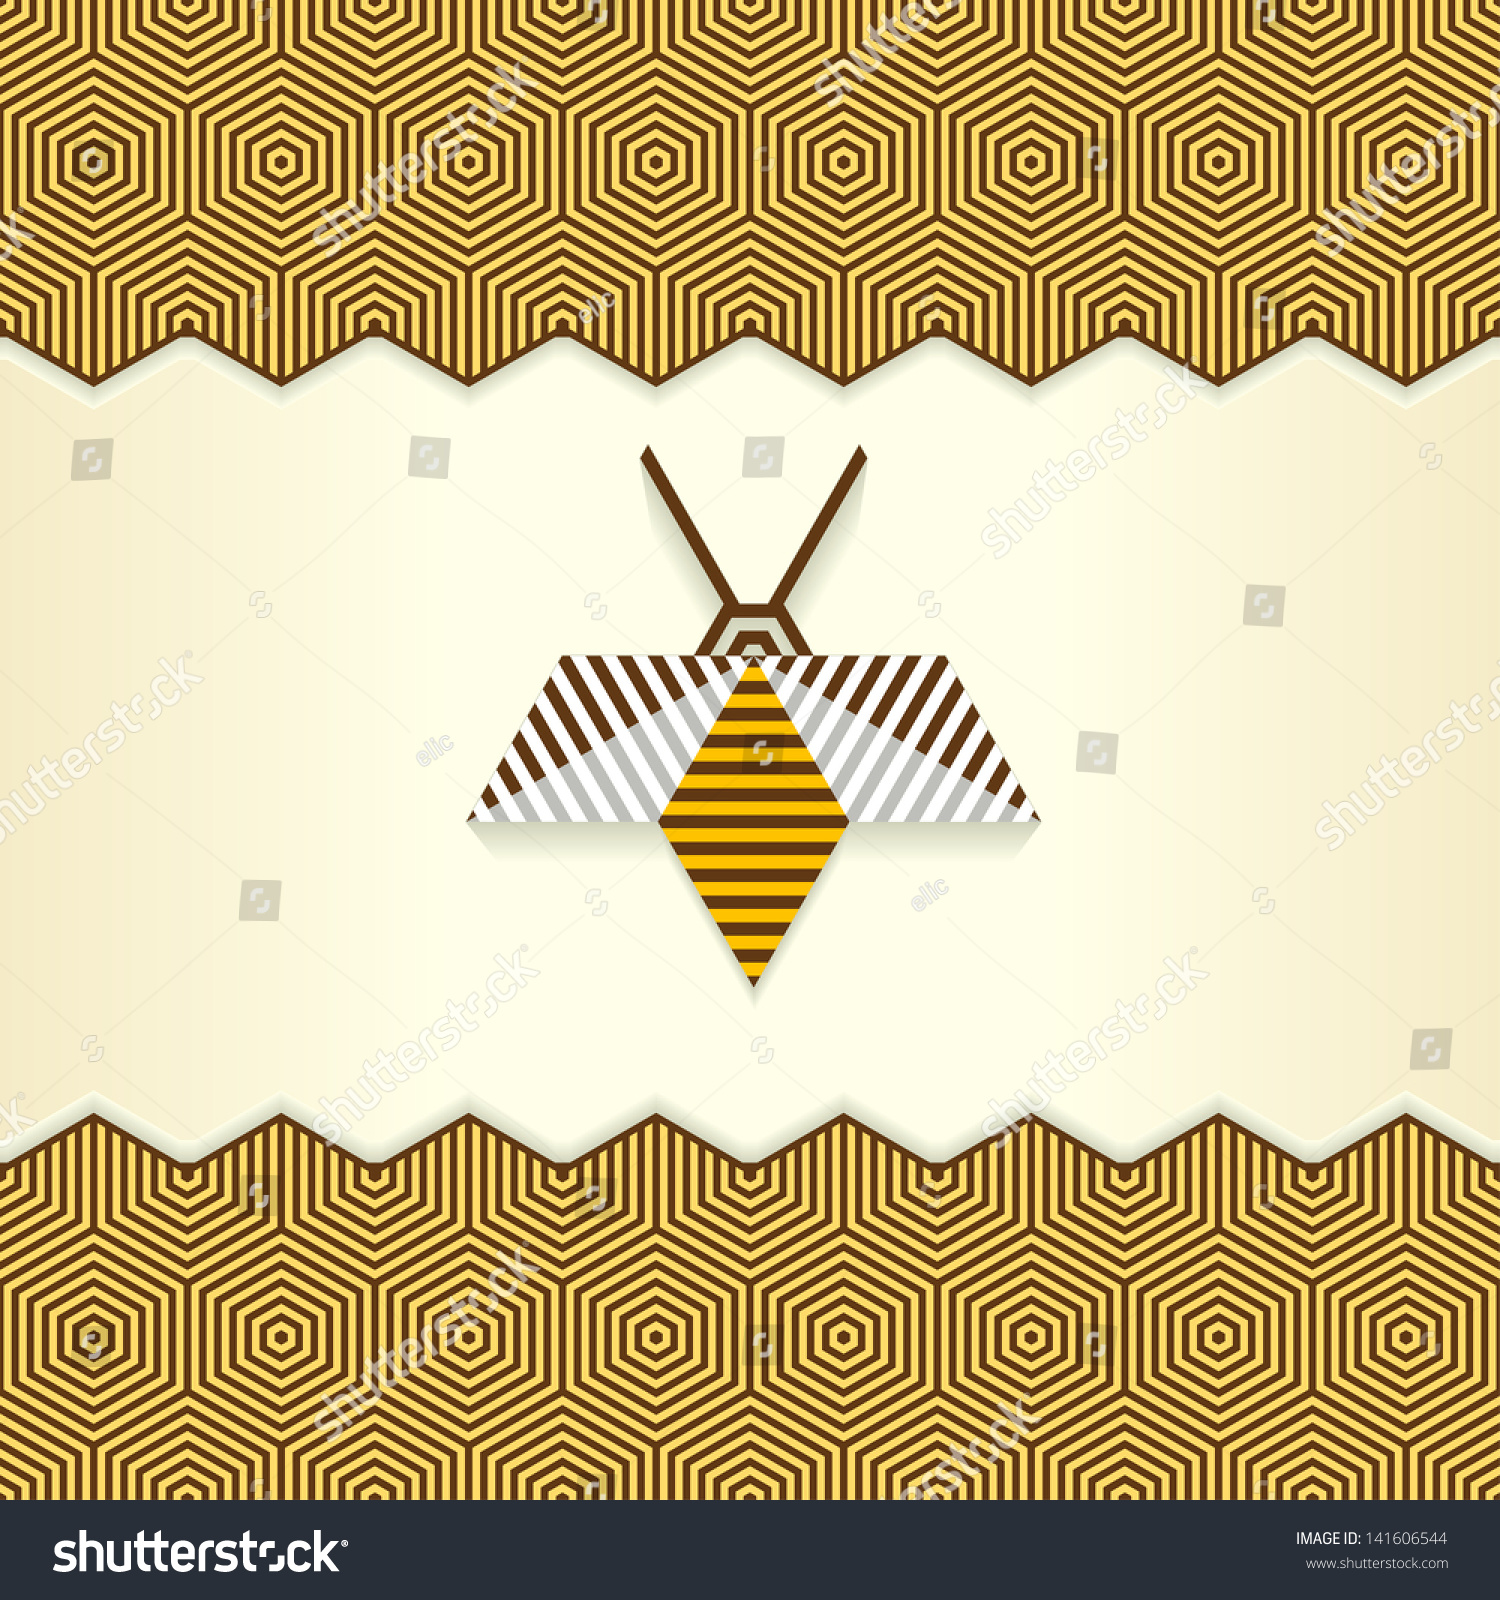 geometric yellow background illustration - photo #30